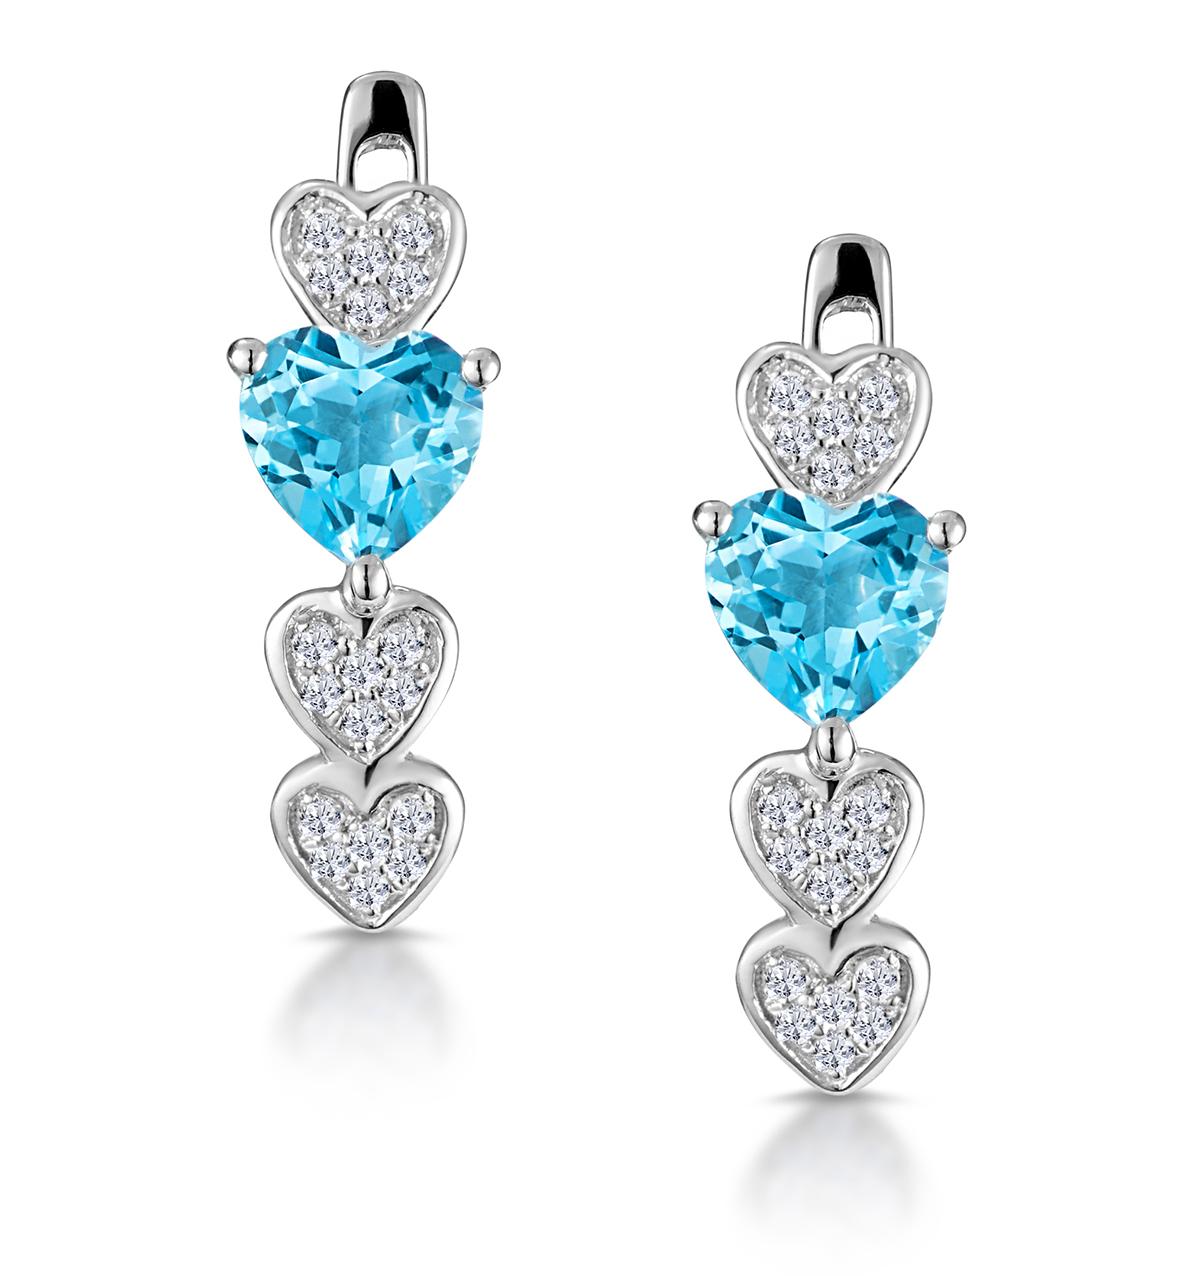 SWISS BLUE TOPAZ AND DIAMOND HEART STELLATO EARRINGS IN 9K WHITE GOLD